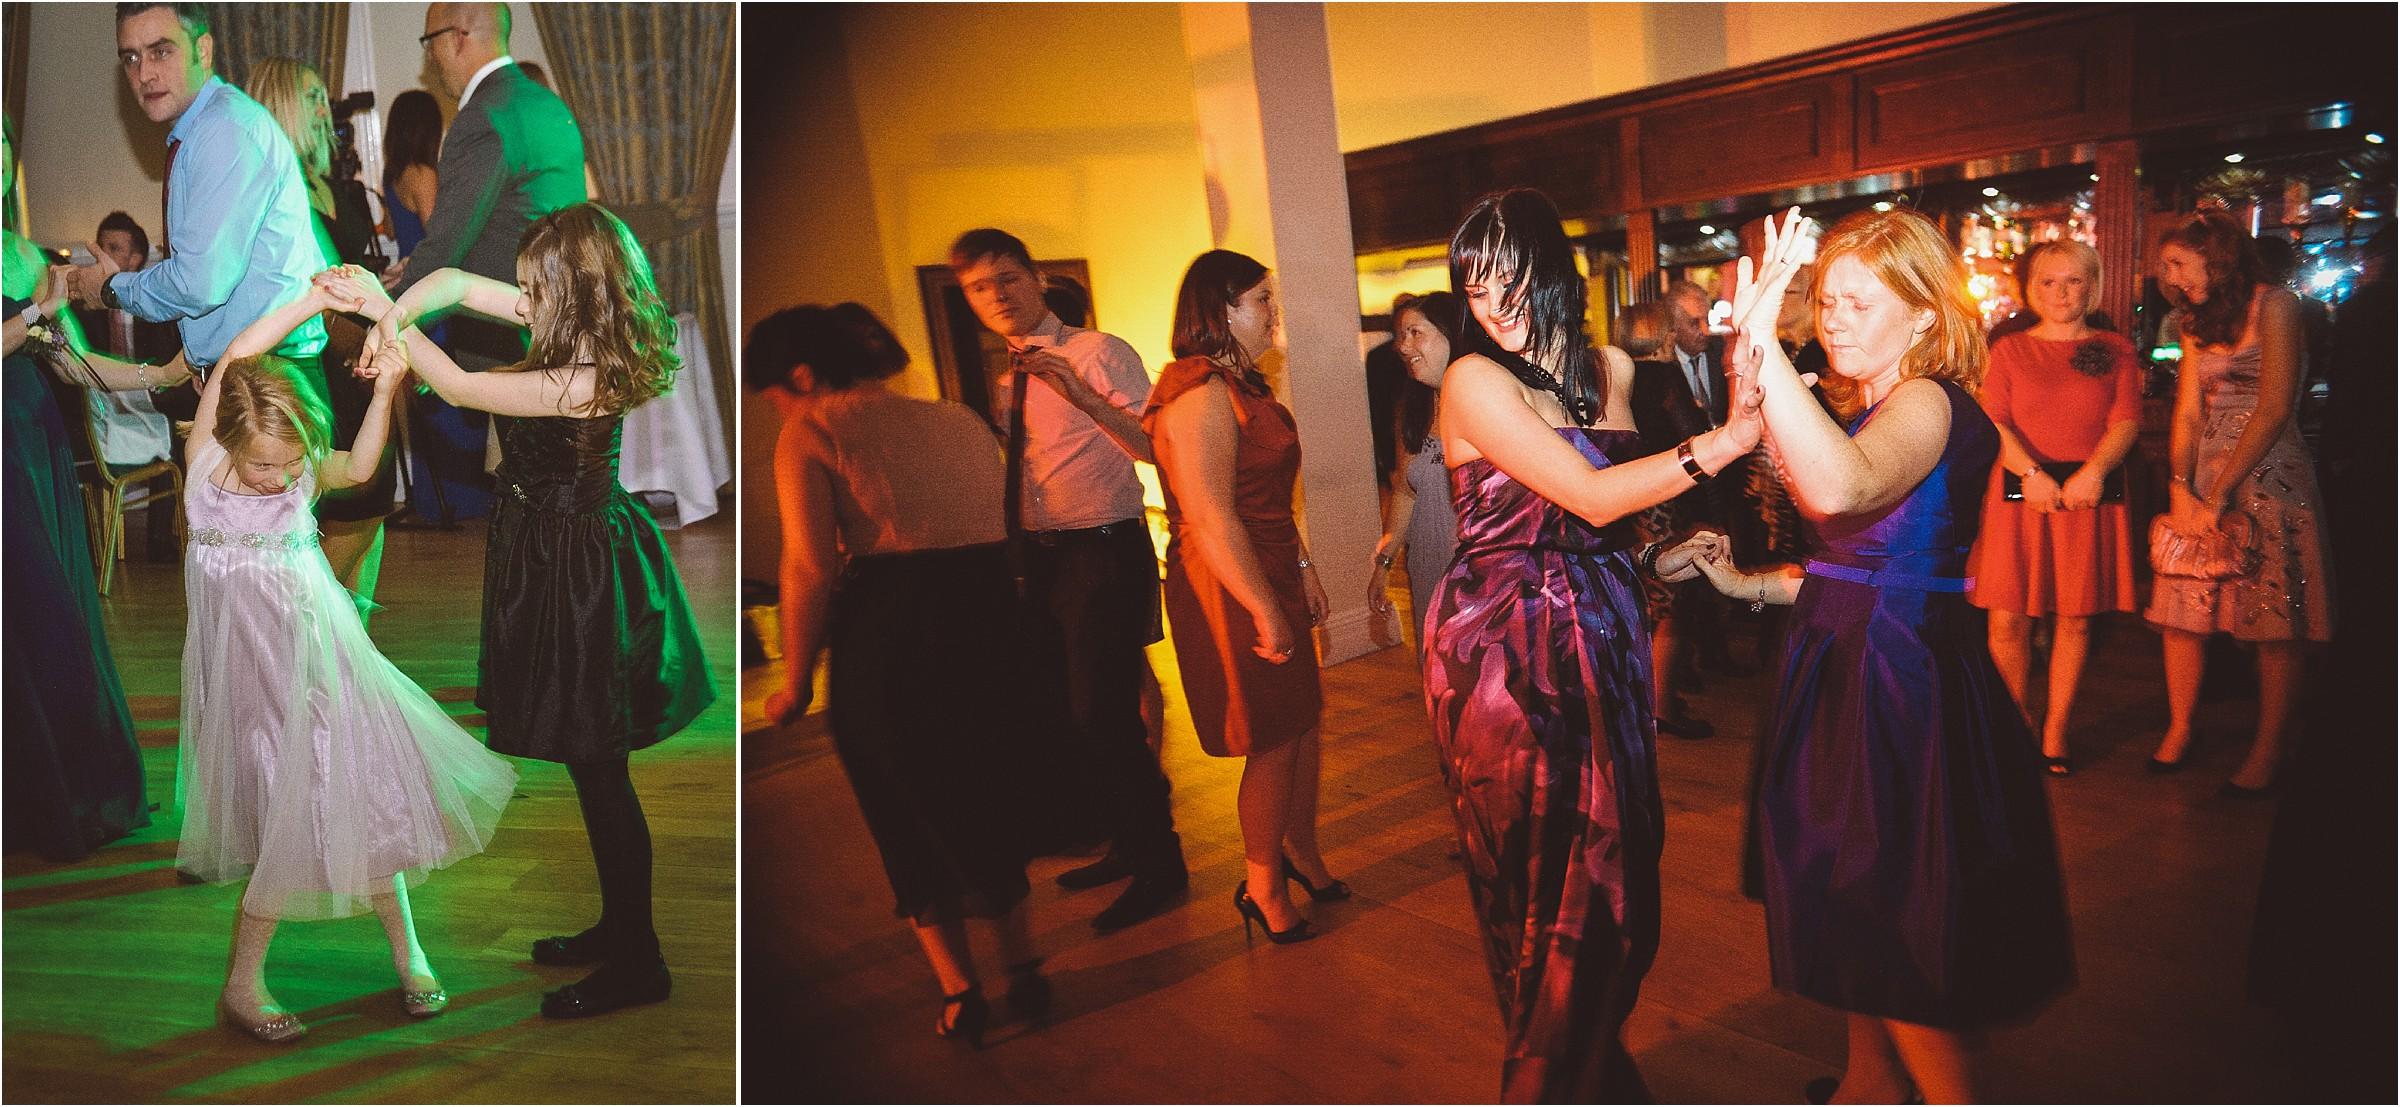 056 wedding photography doxford hall northumberlandDSC_1301e